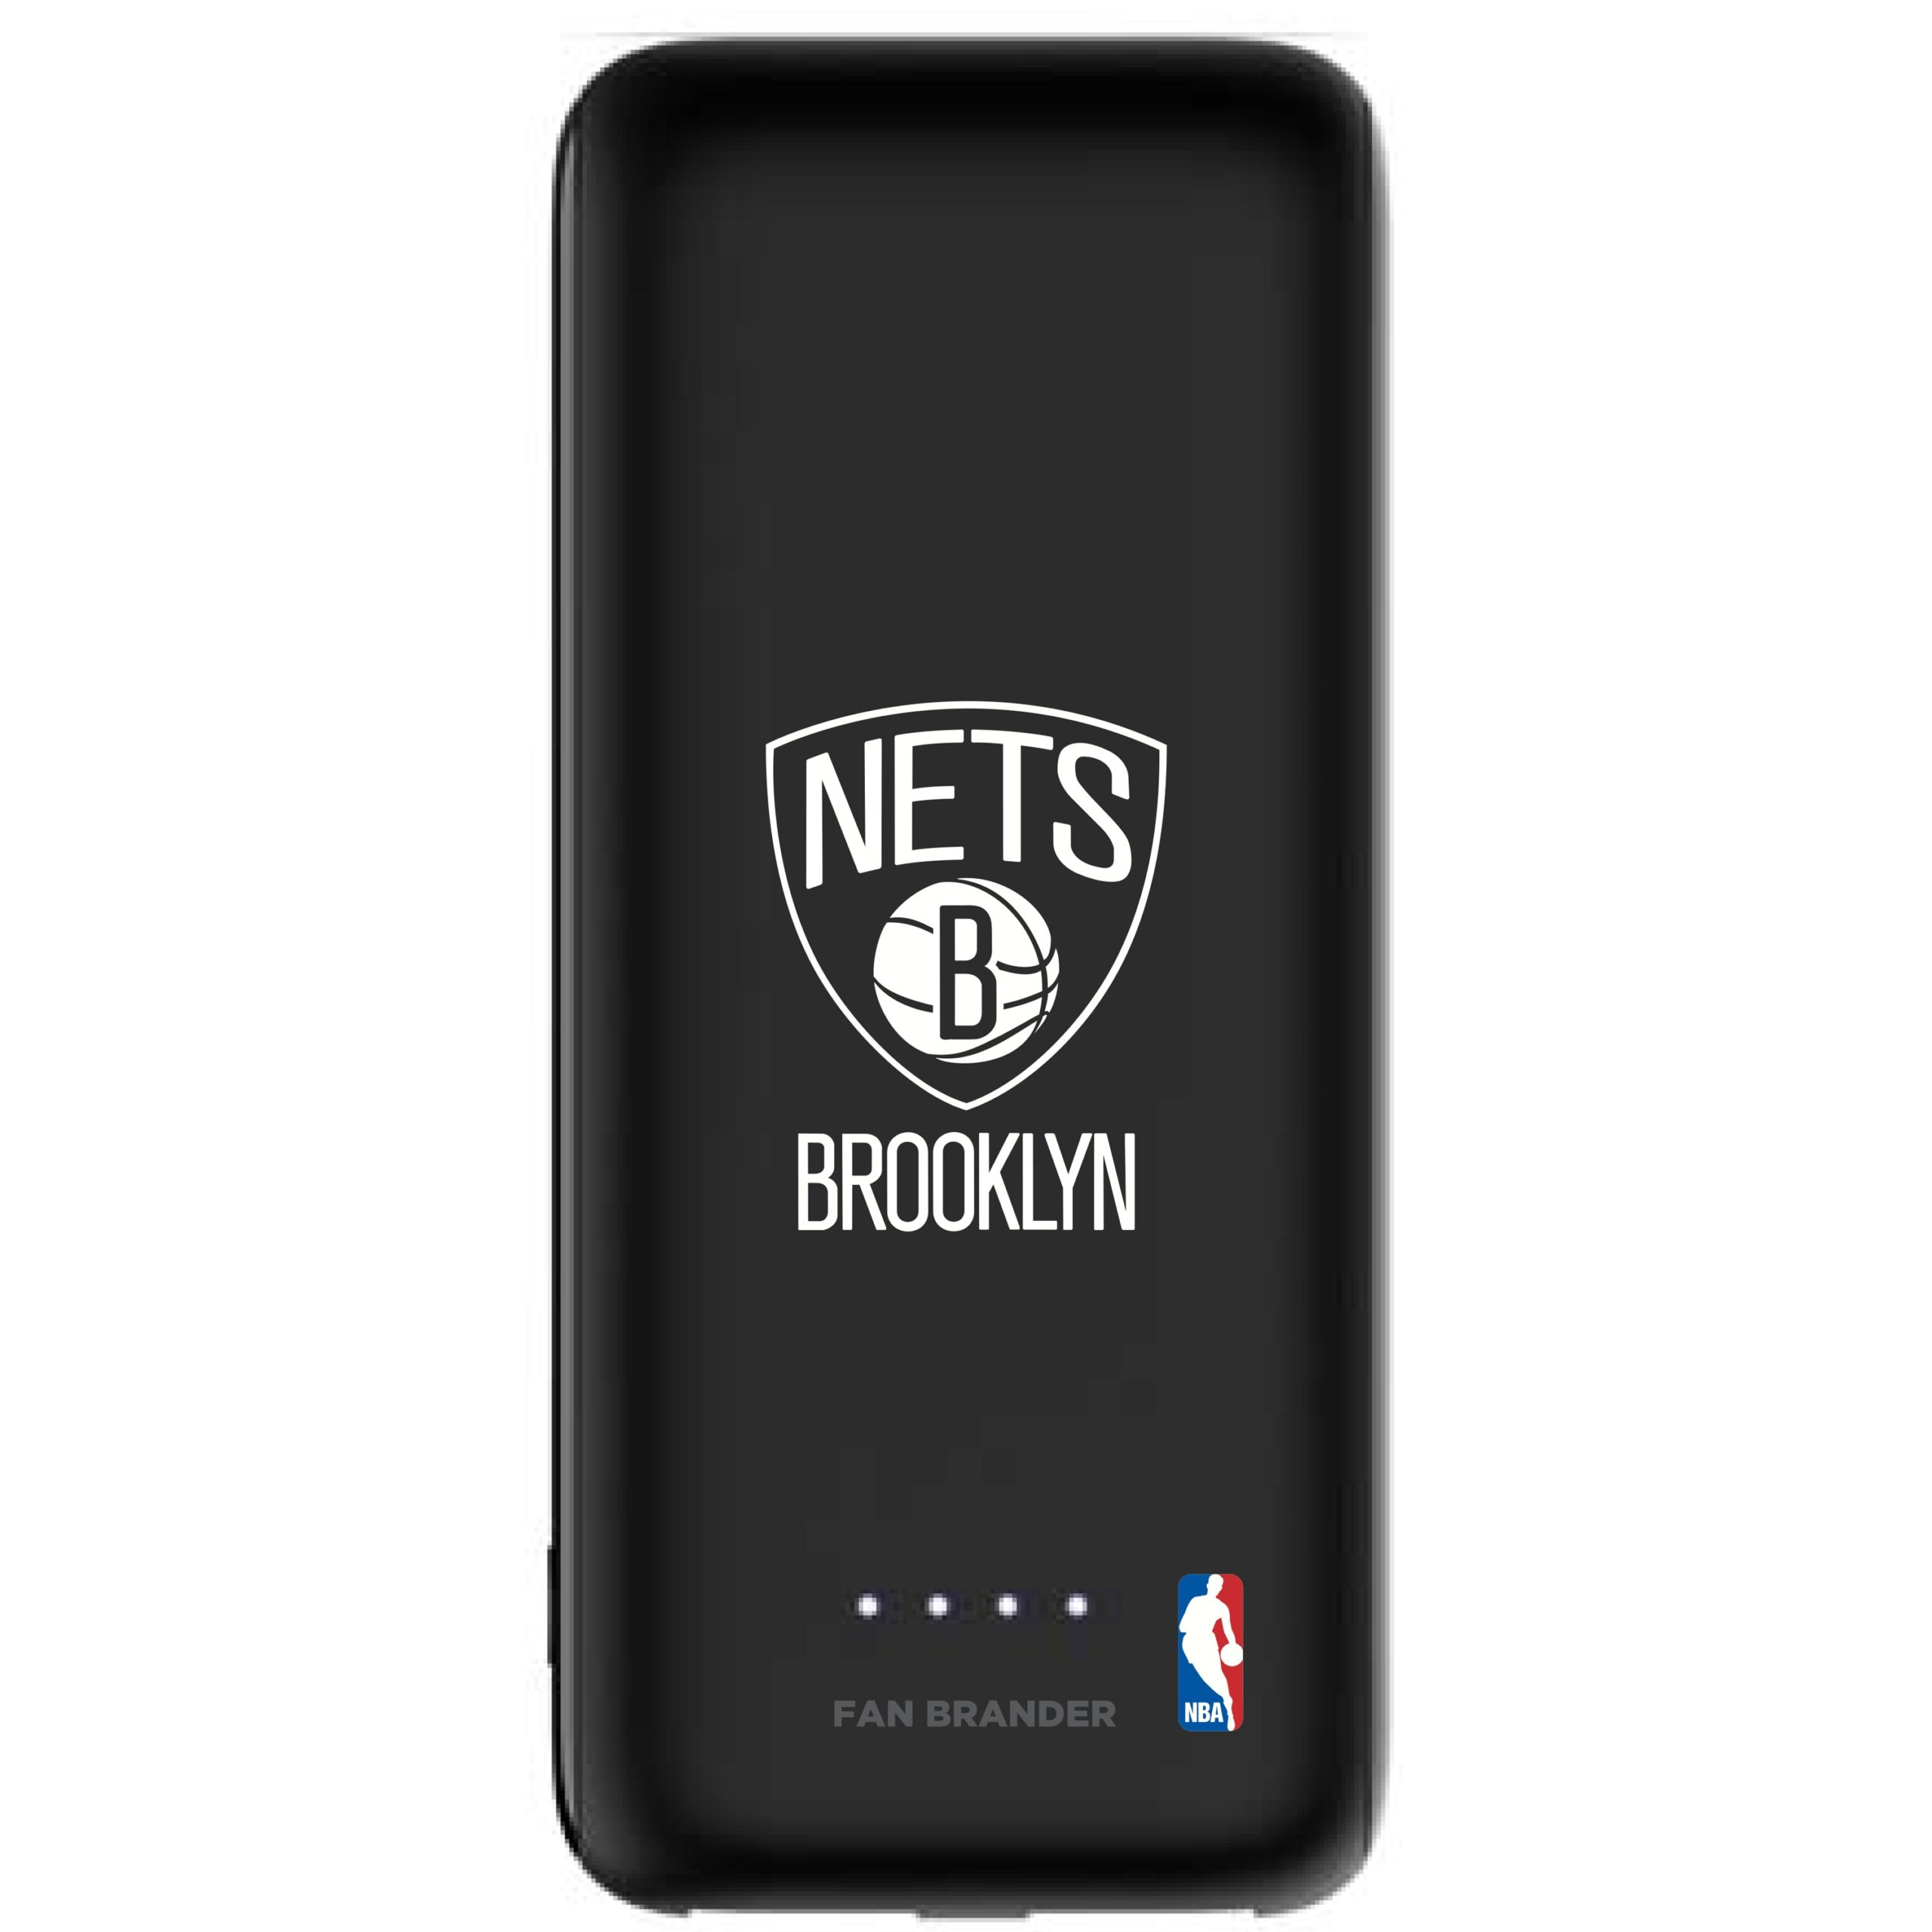 Brooklyn Nets mophie 5200 mAh Universal Battery Power Boost